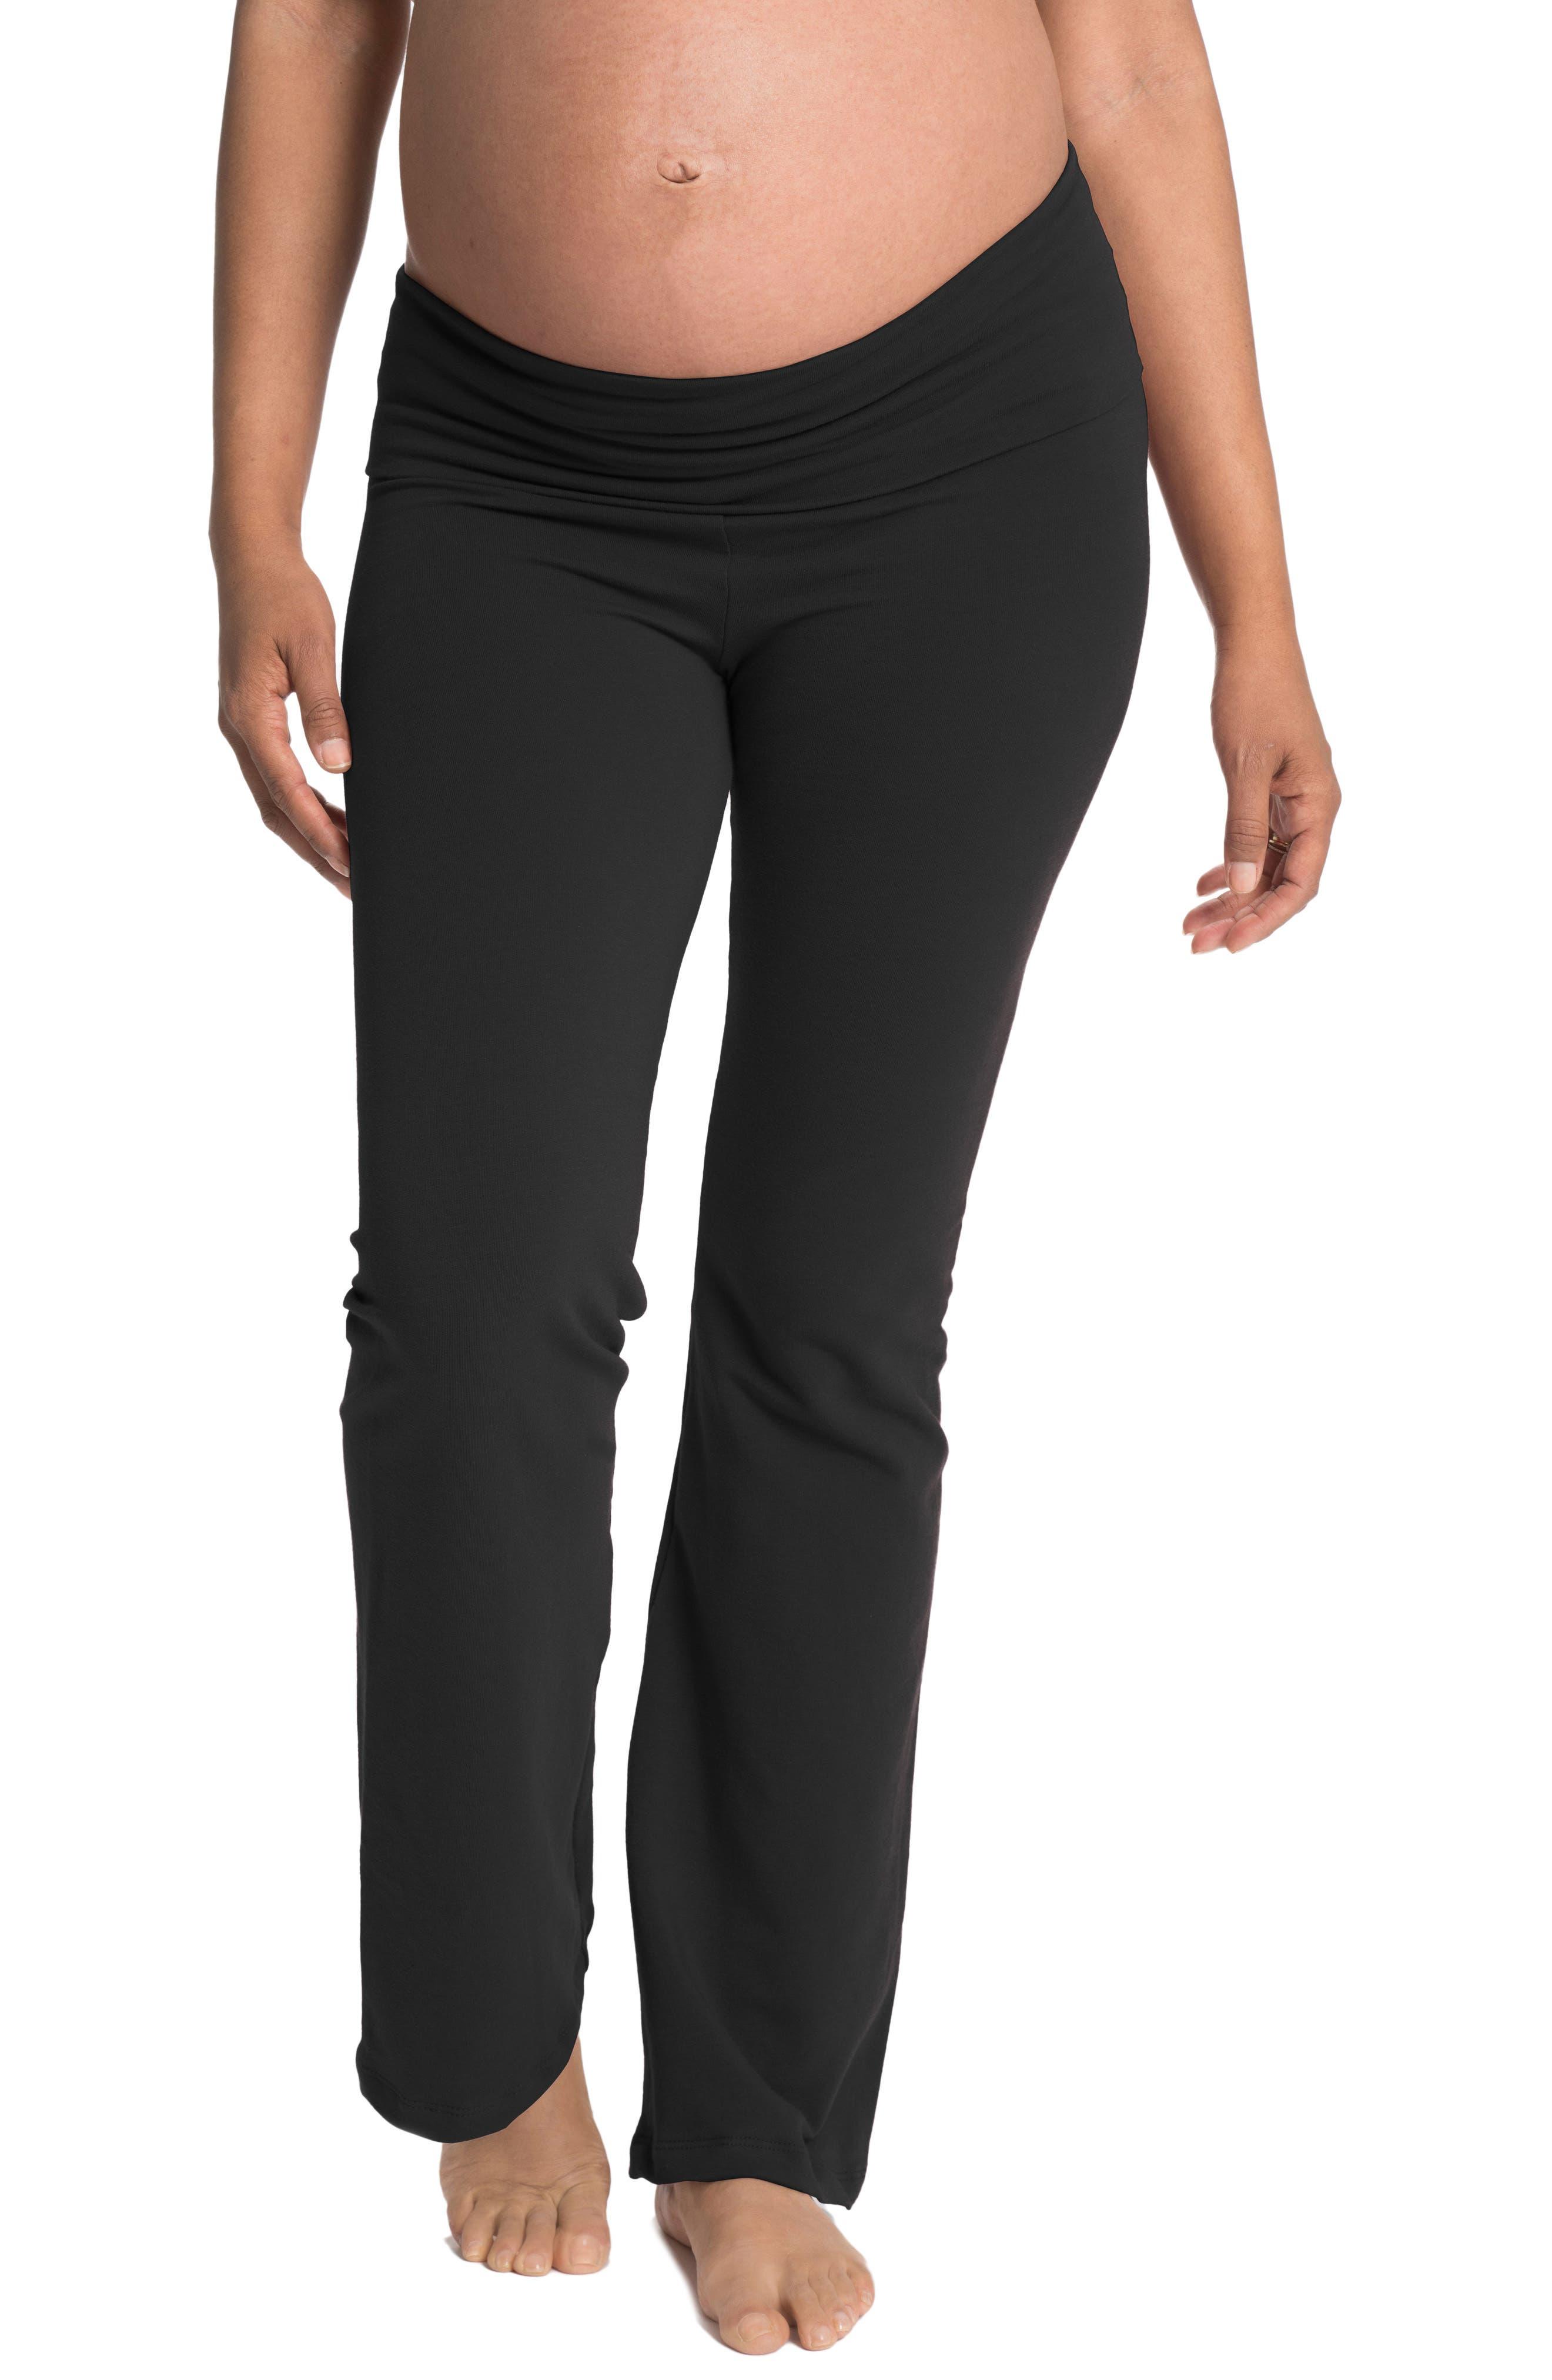 Cozy Wide Leg Foldover Maternity Pants,                         Main,                         color, 005